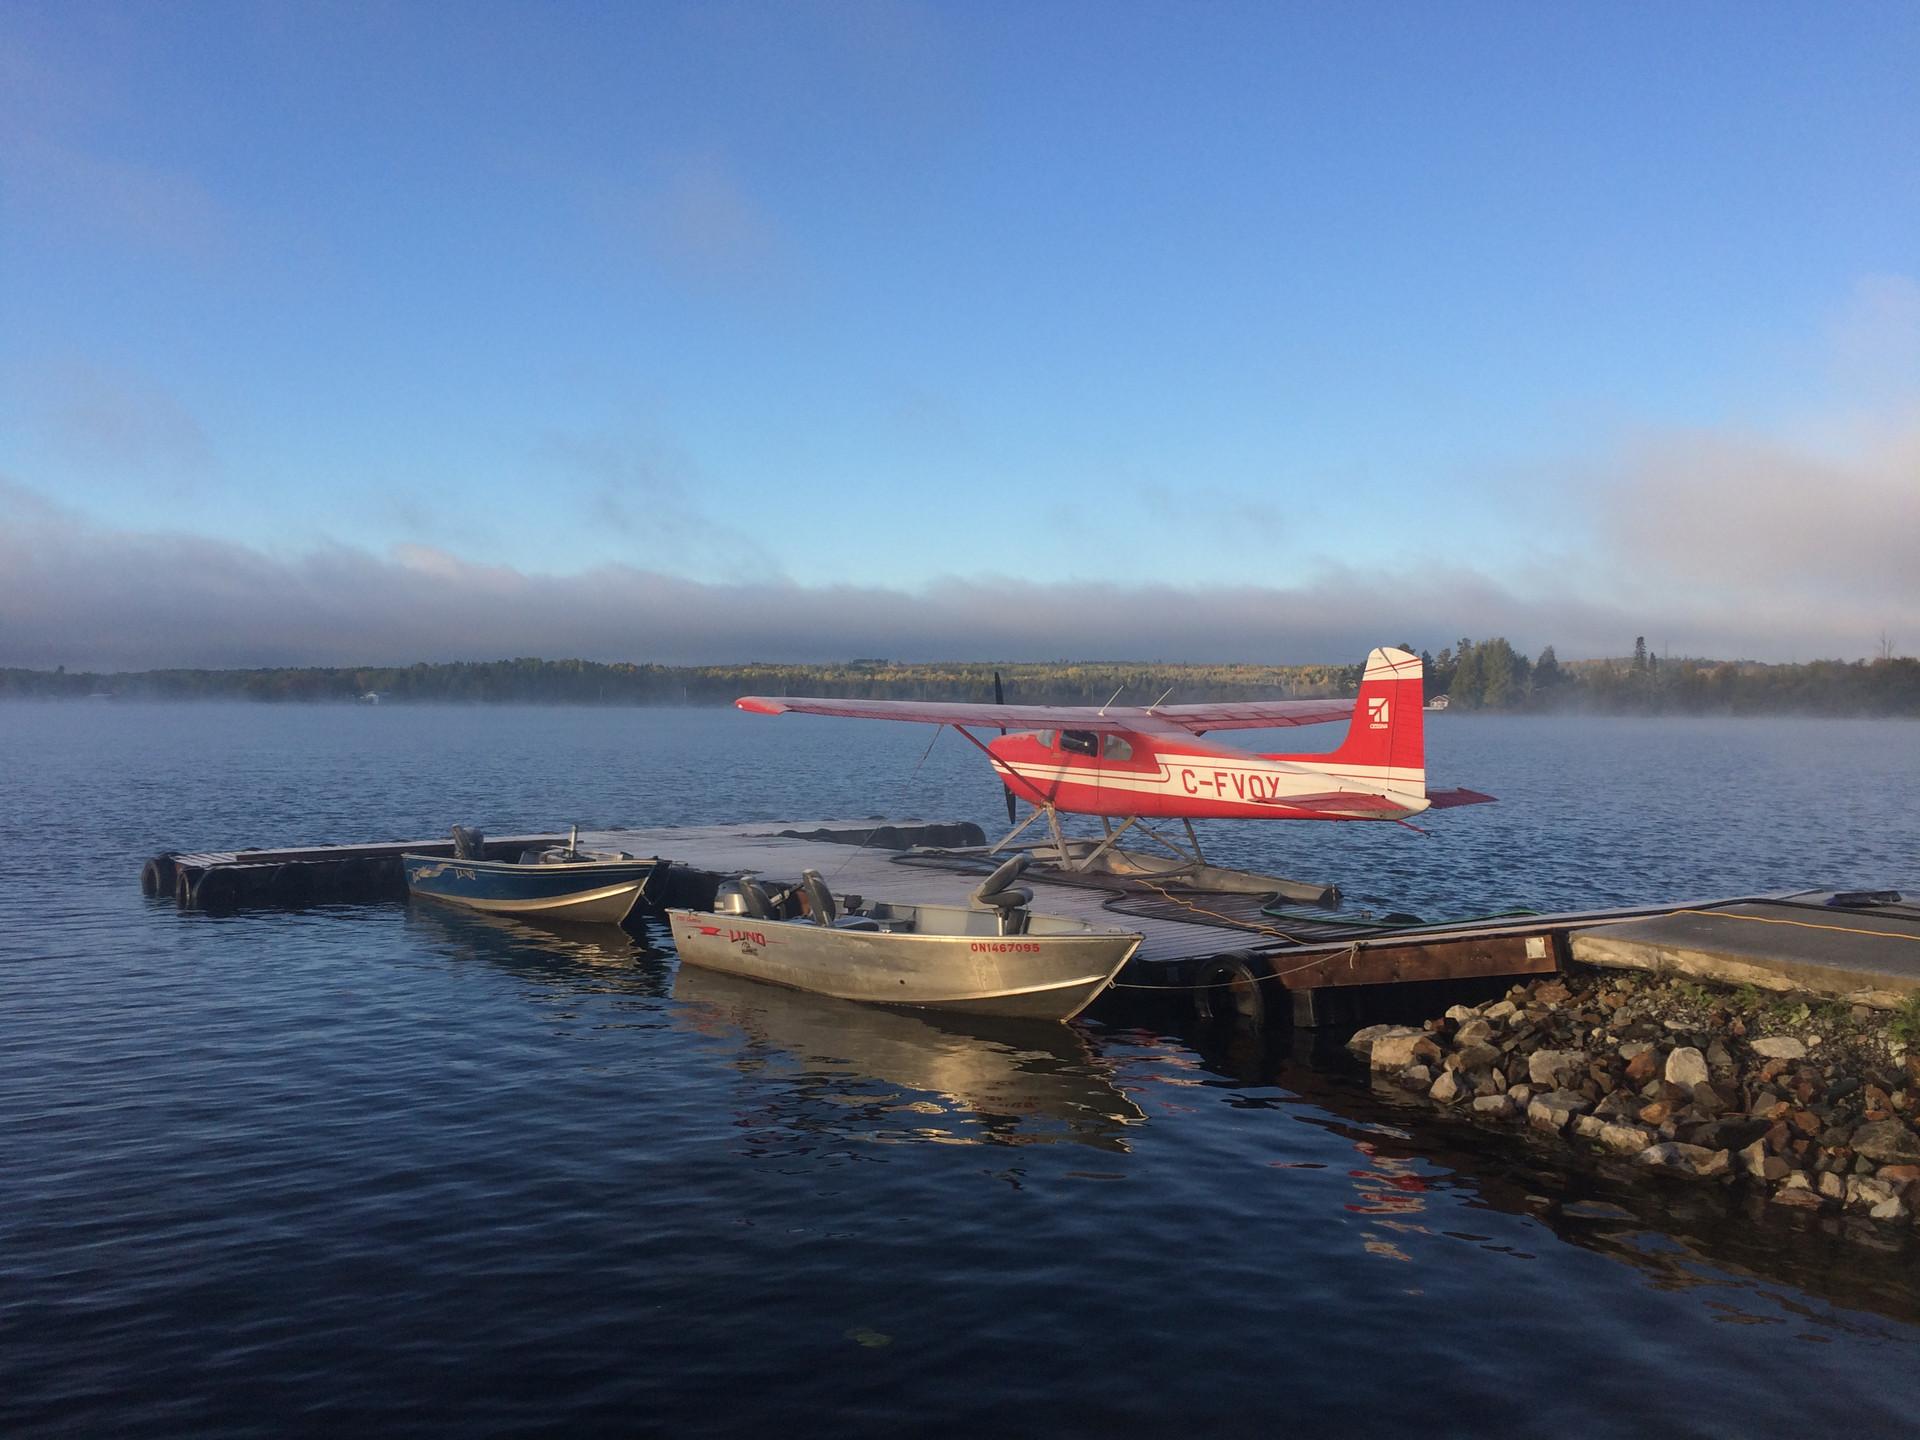 Cessna 180 floatplane